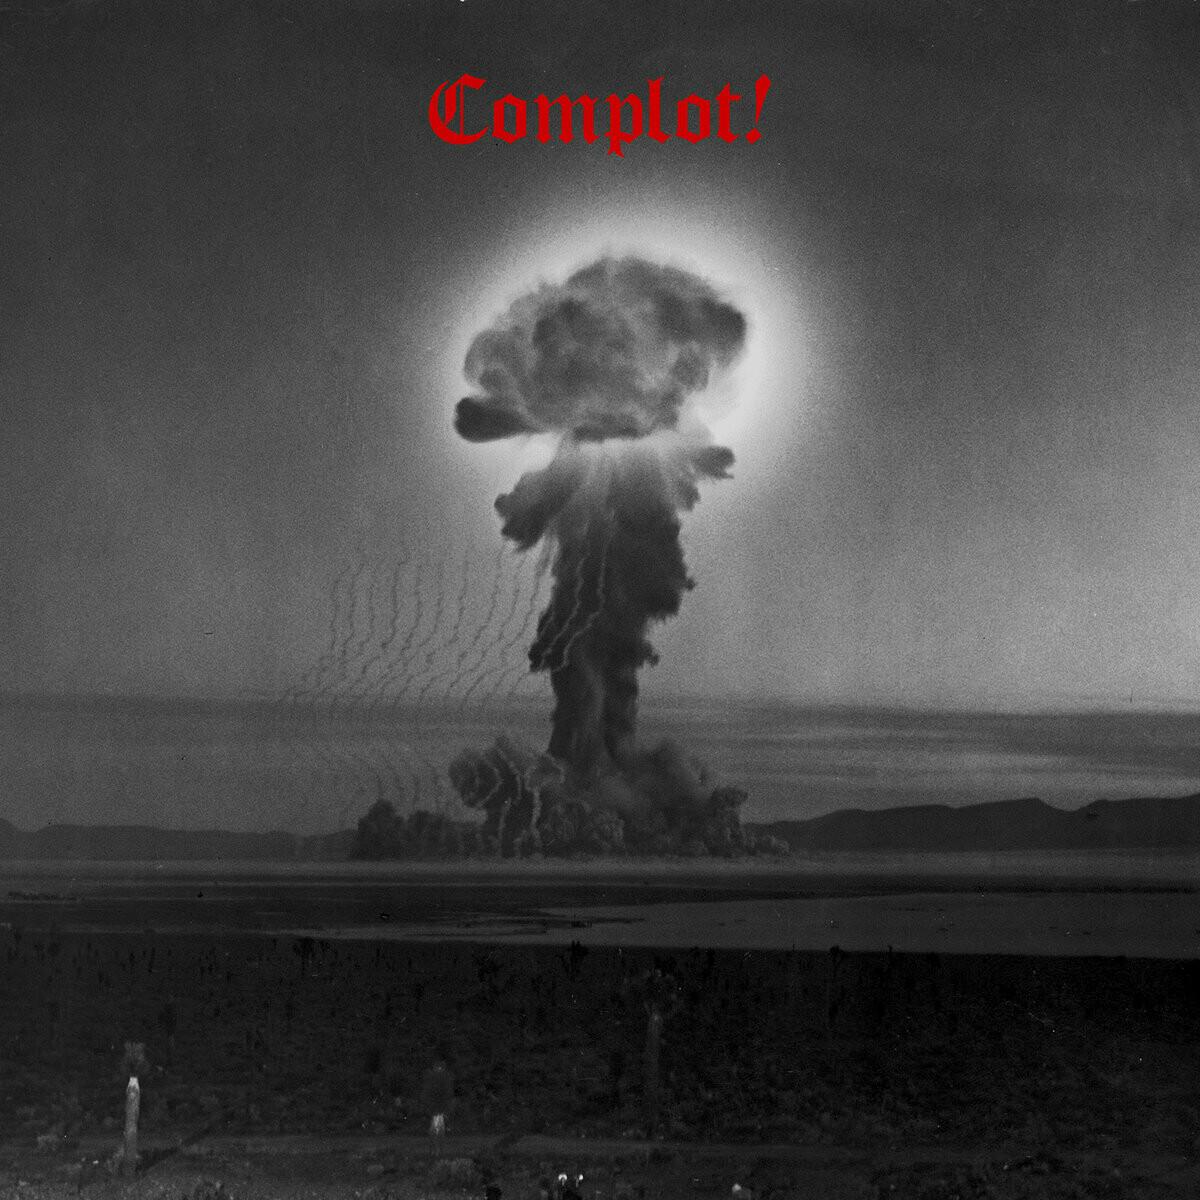 Complot! - Compilation